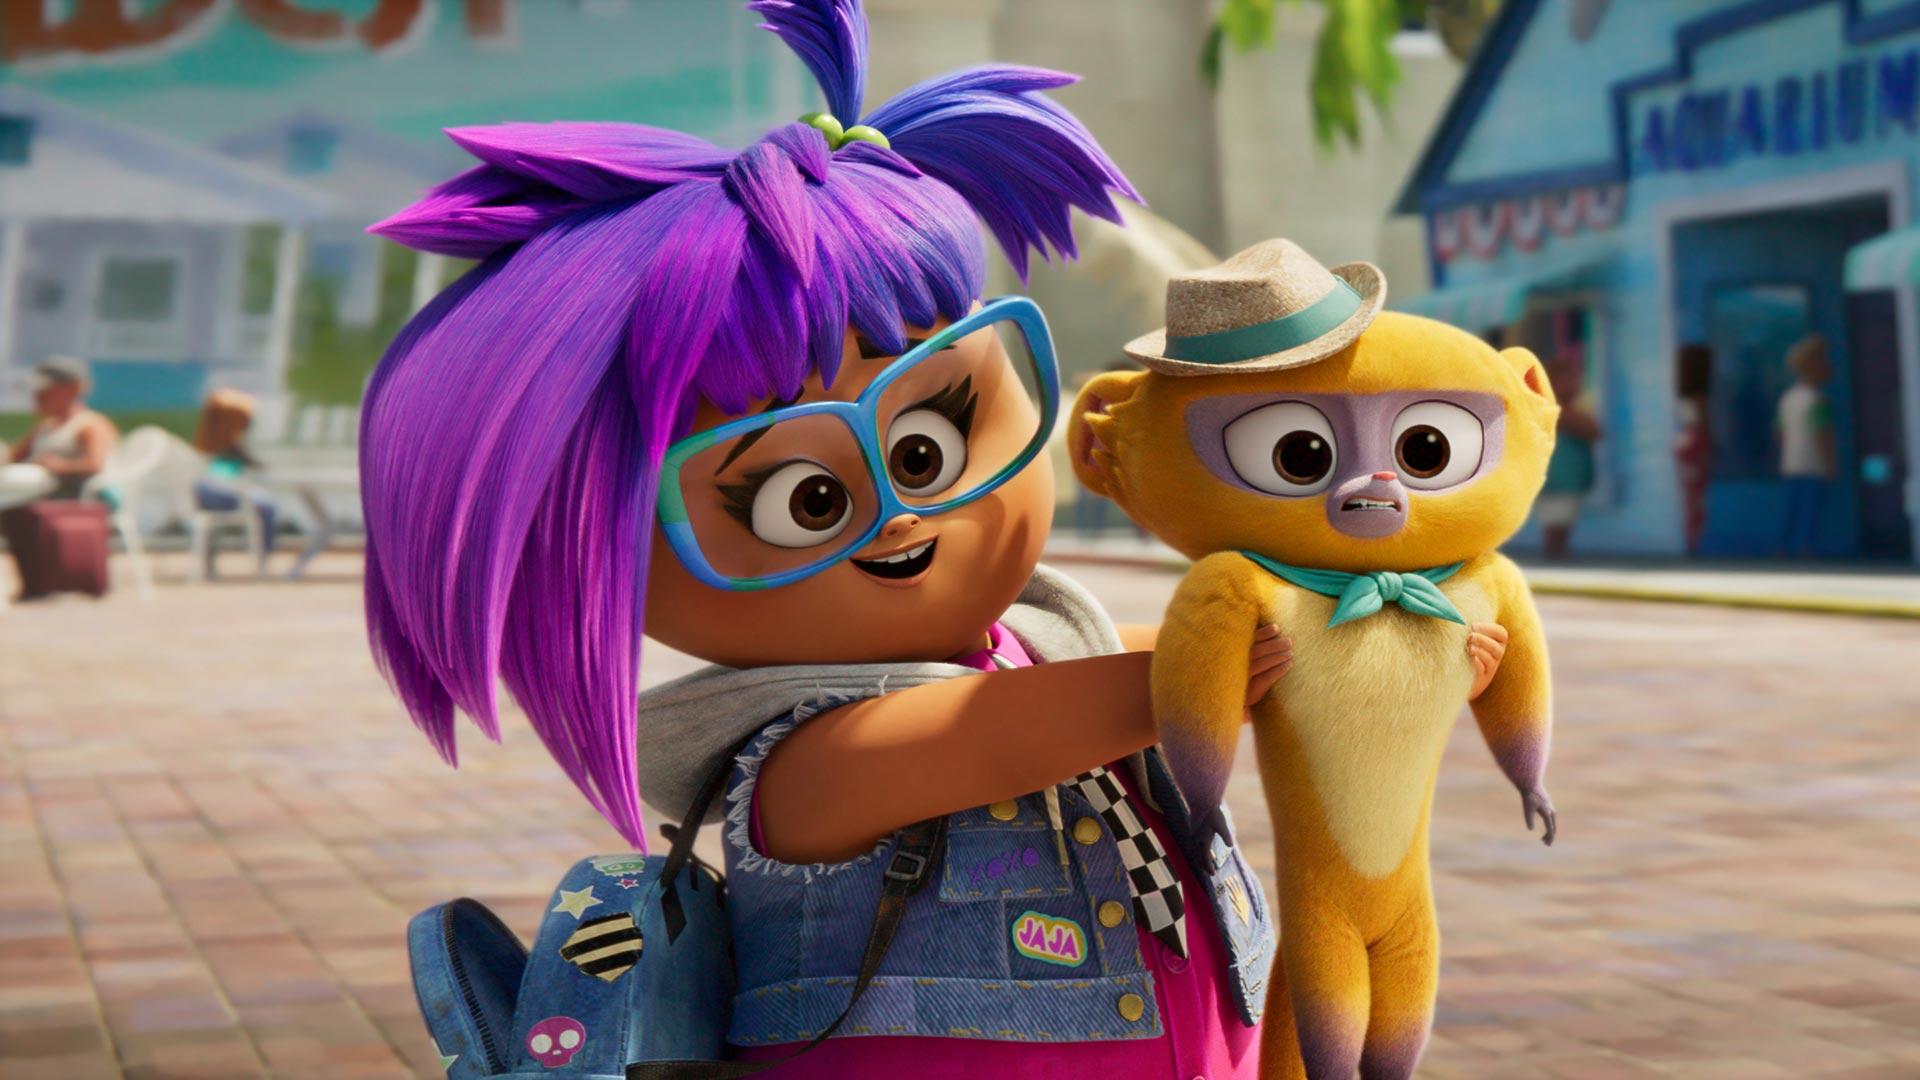 انیمیشن کمدی و موزیکال ویوو 2021 1